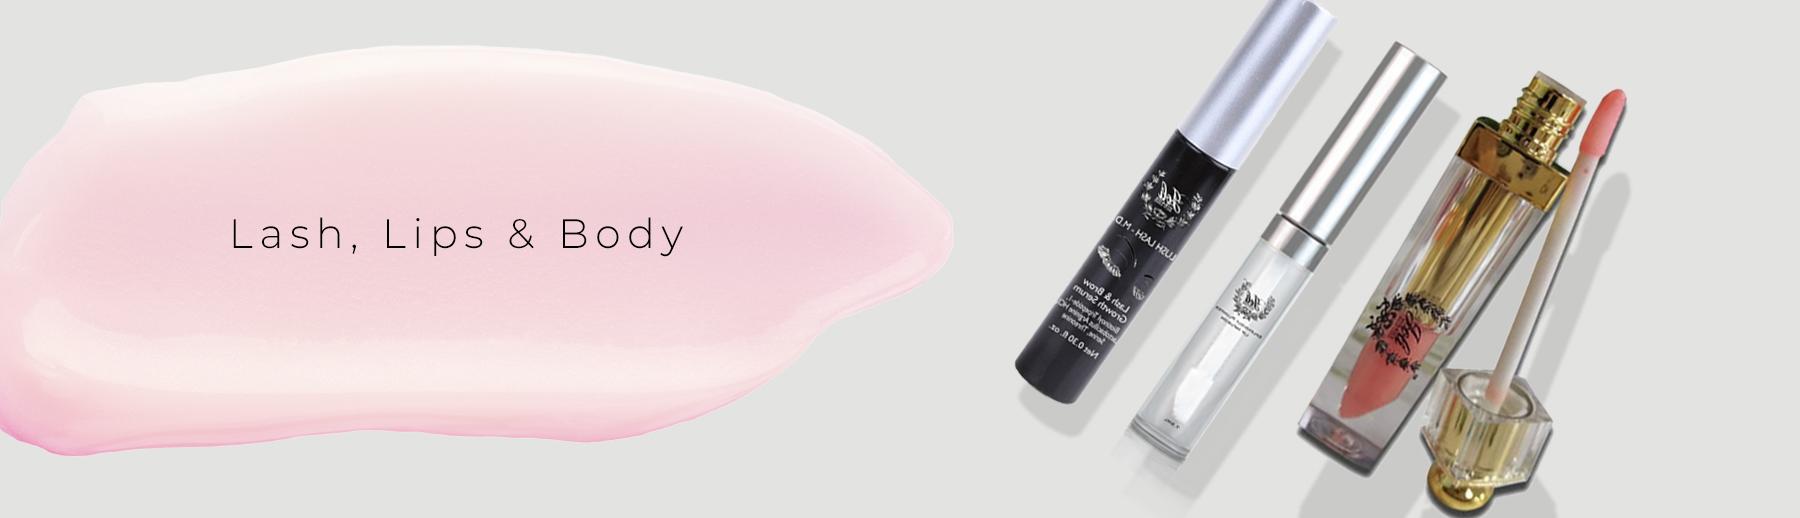 lash-lips-body-banner-4.jpg